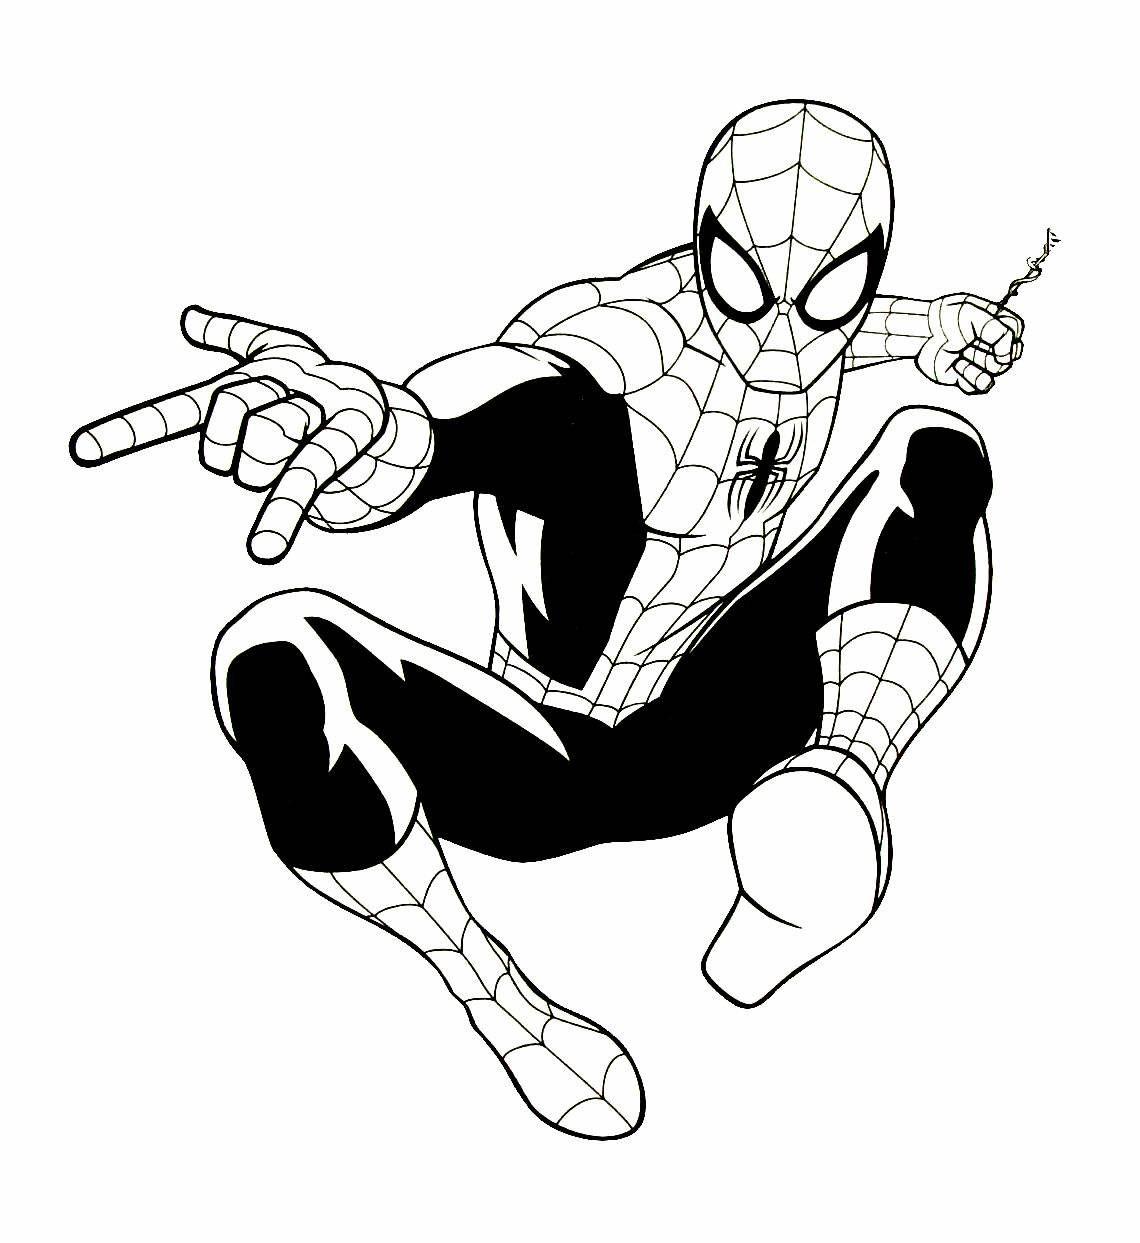 Spiderman Coloring Book Page Spiderman Drawing Spiderman Coloring Superhero Art